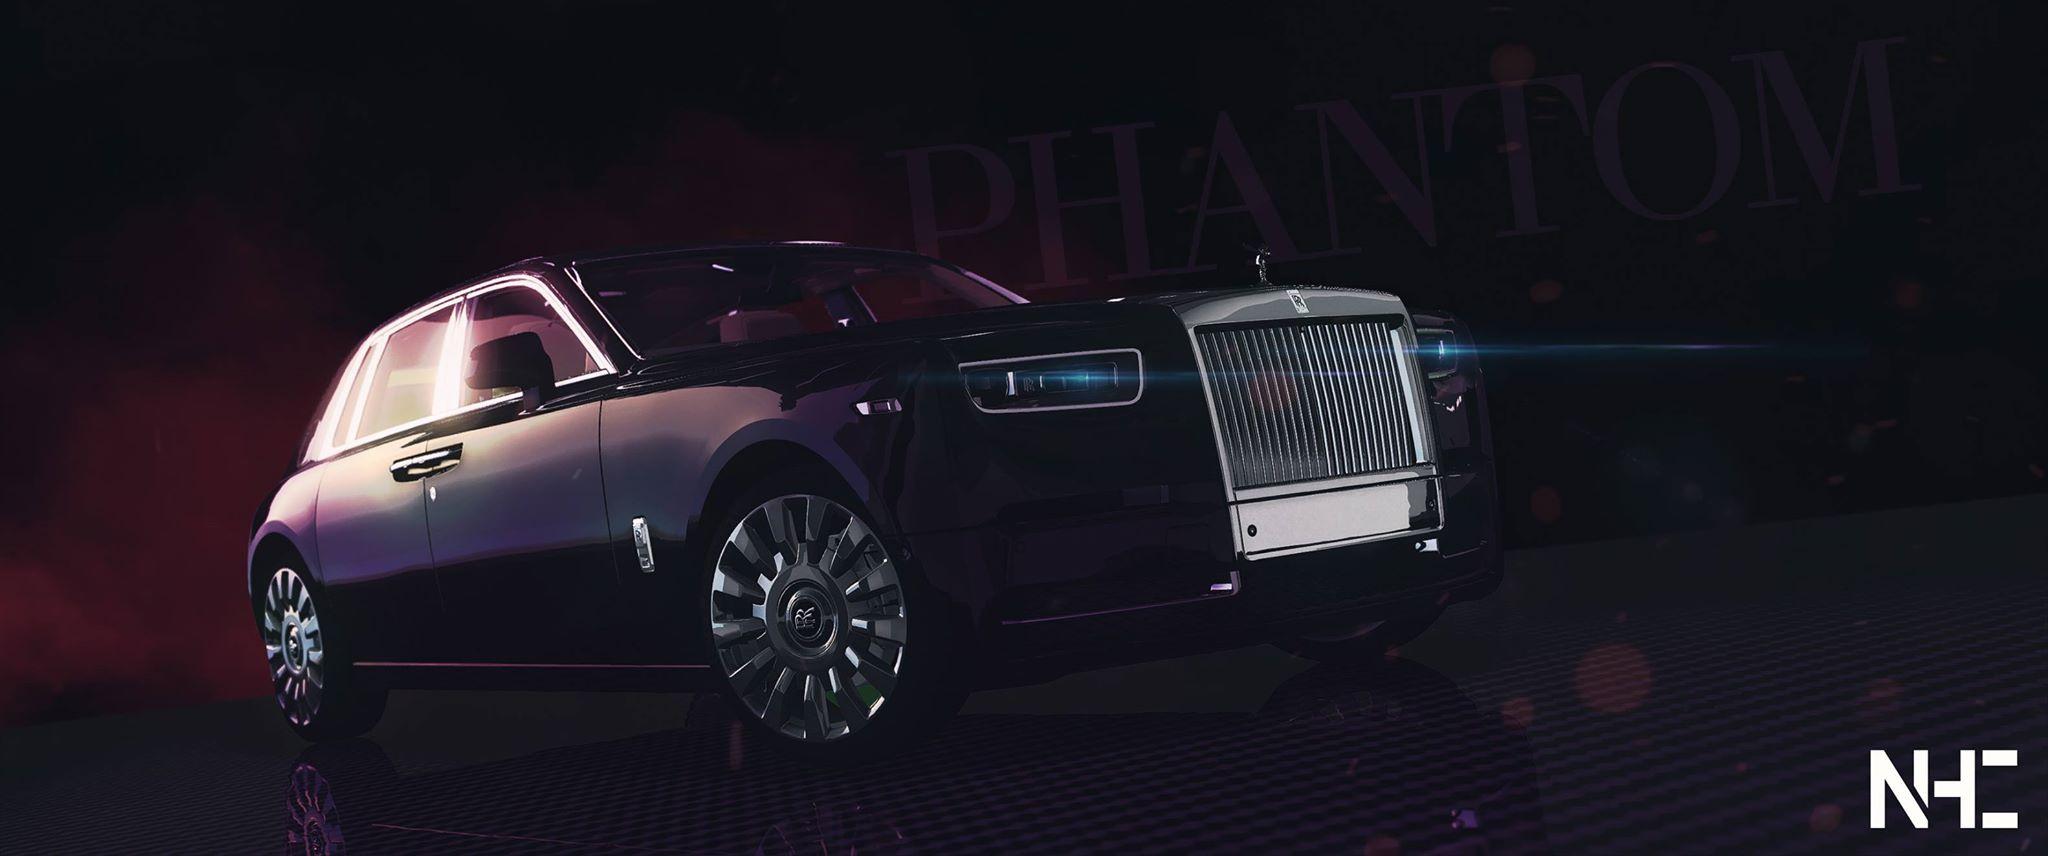 100 roll royce phantom 2018 rolls royce phantom 2018 mule 10 rugpj io 2017 autogespot. Black Bedroom Furniture Sets. Home Design Ideas